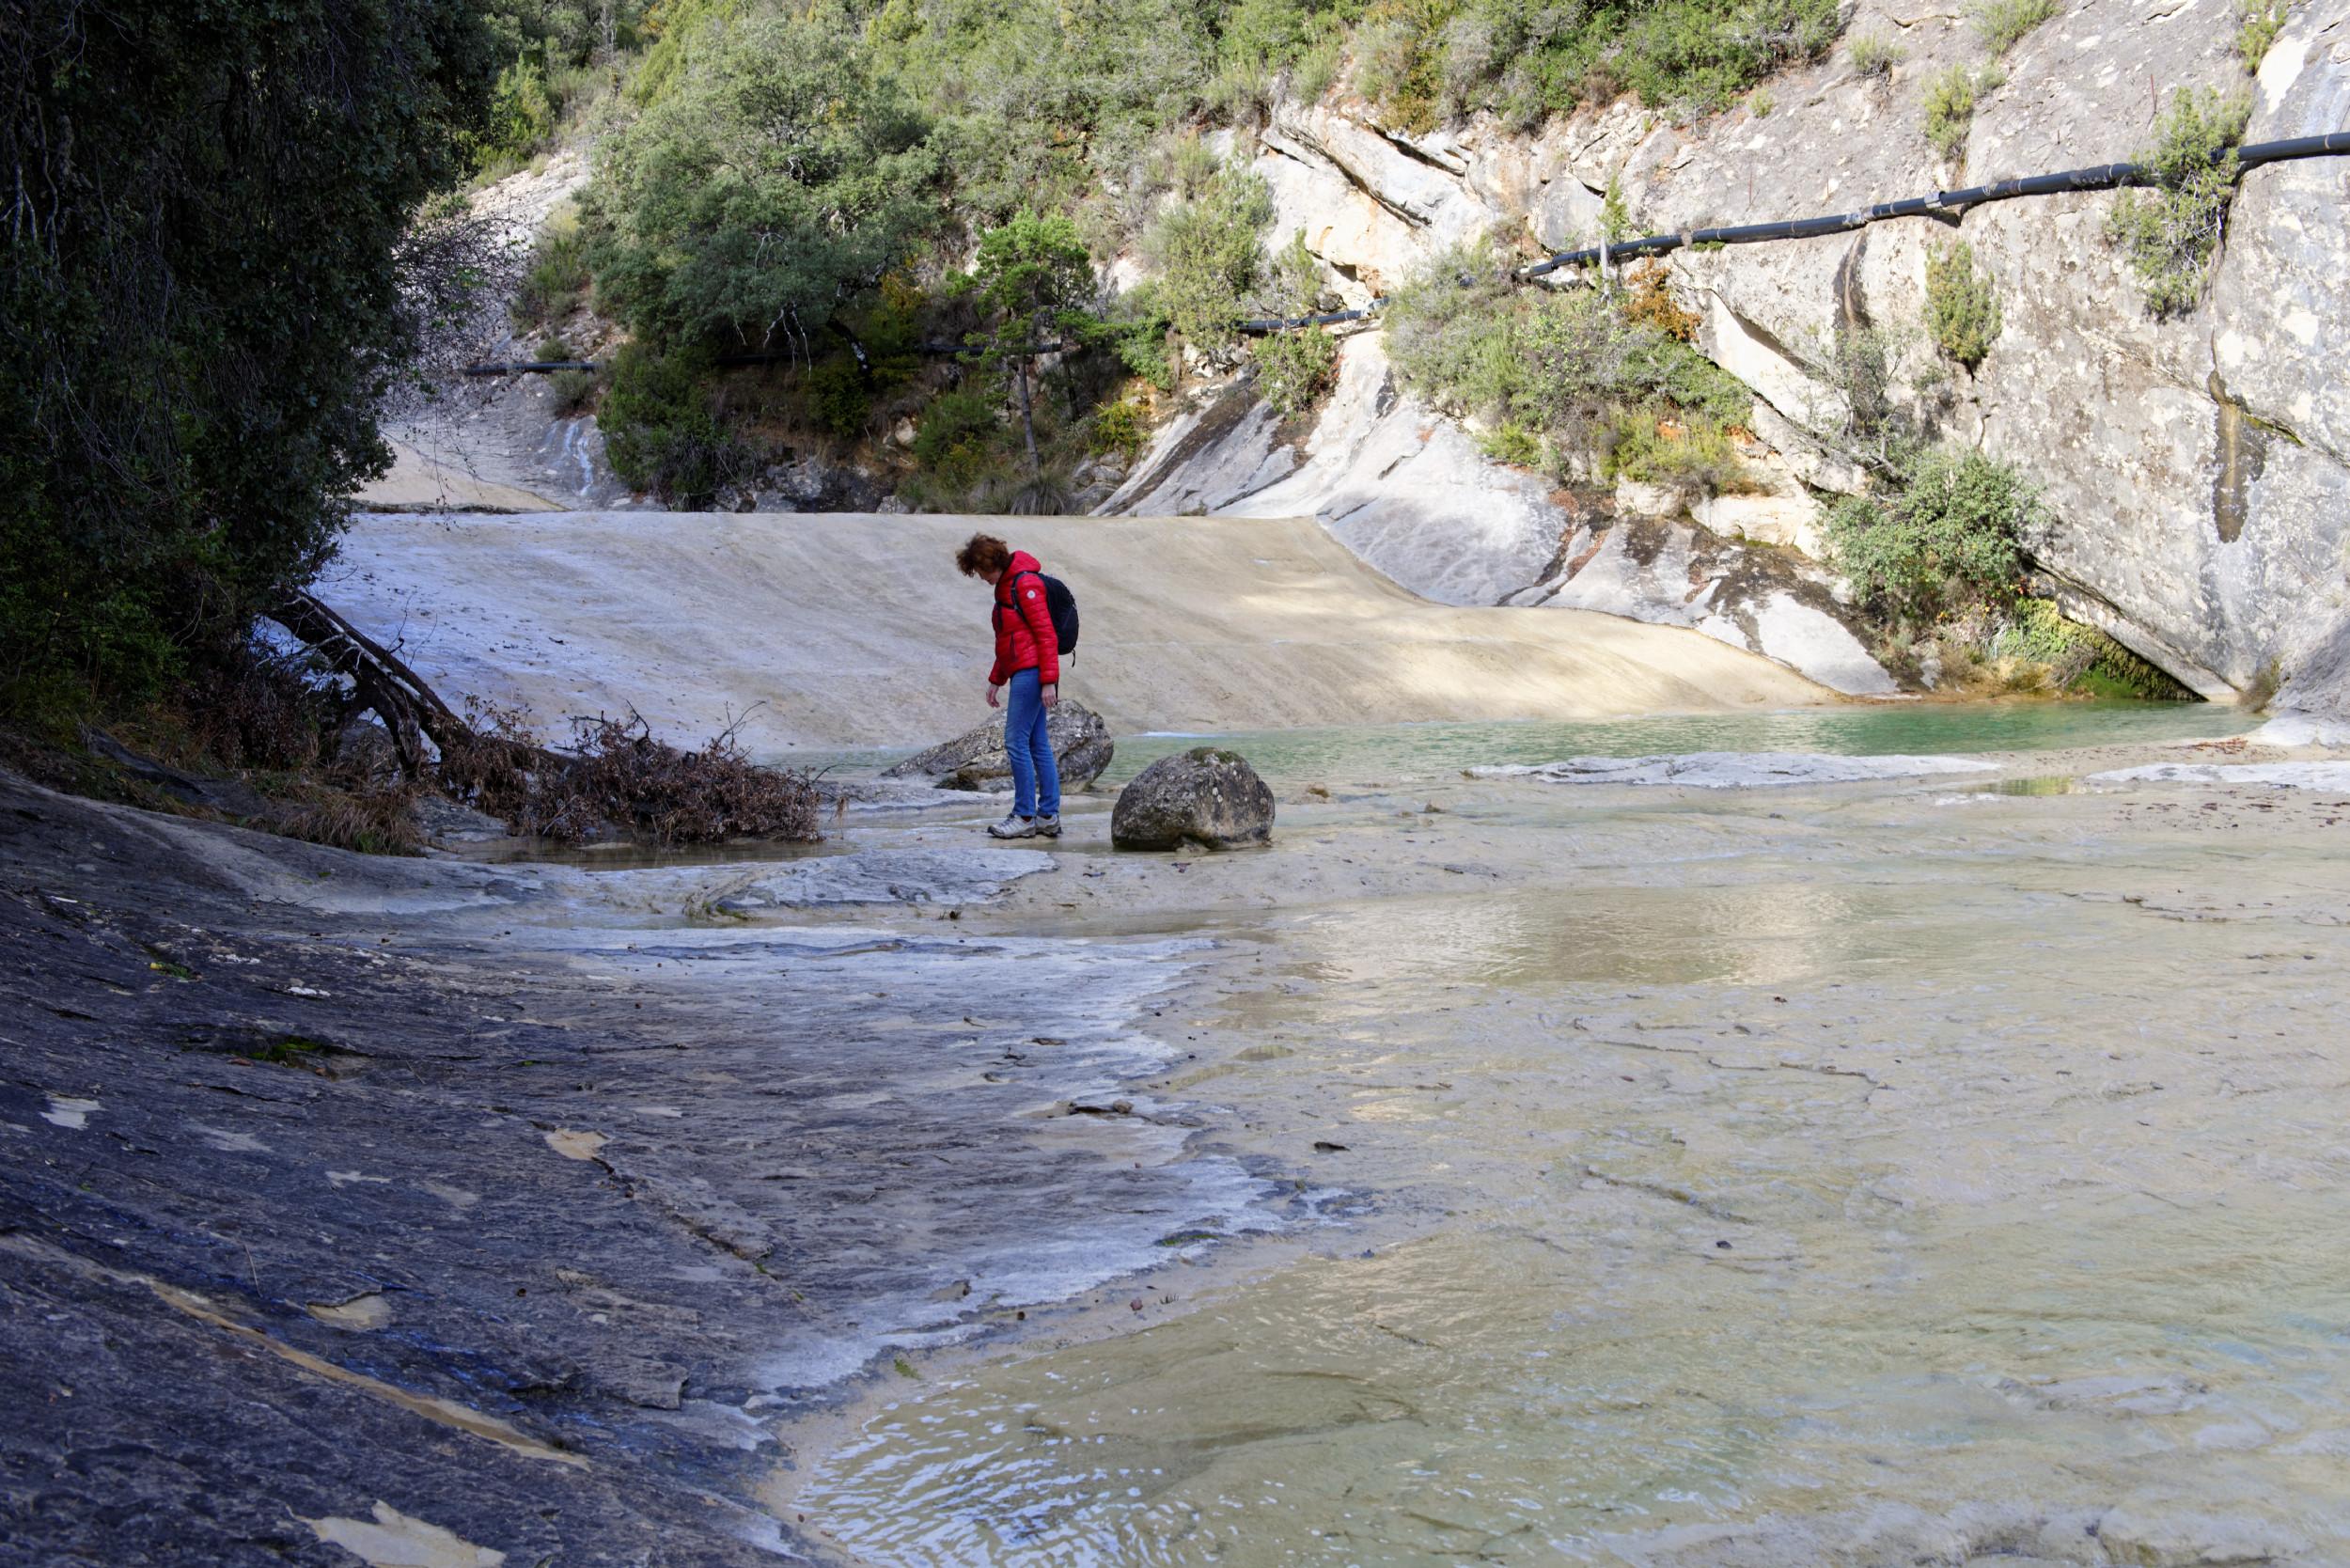 141208-Sieste - Canyon et Barranco (Sobrarbe) (23)